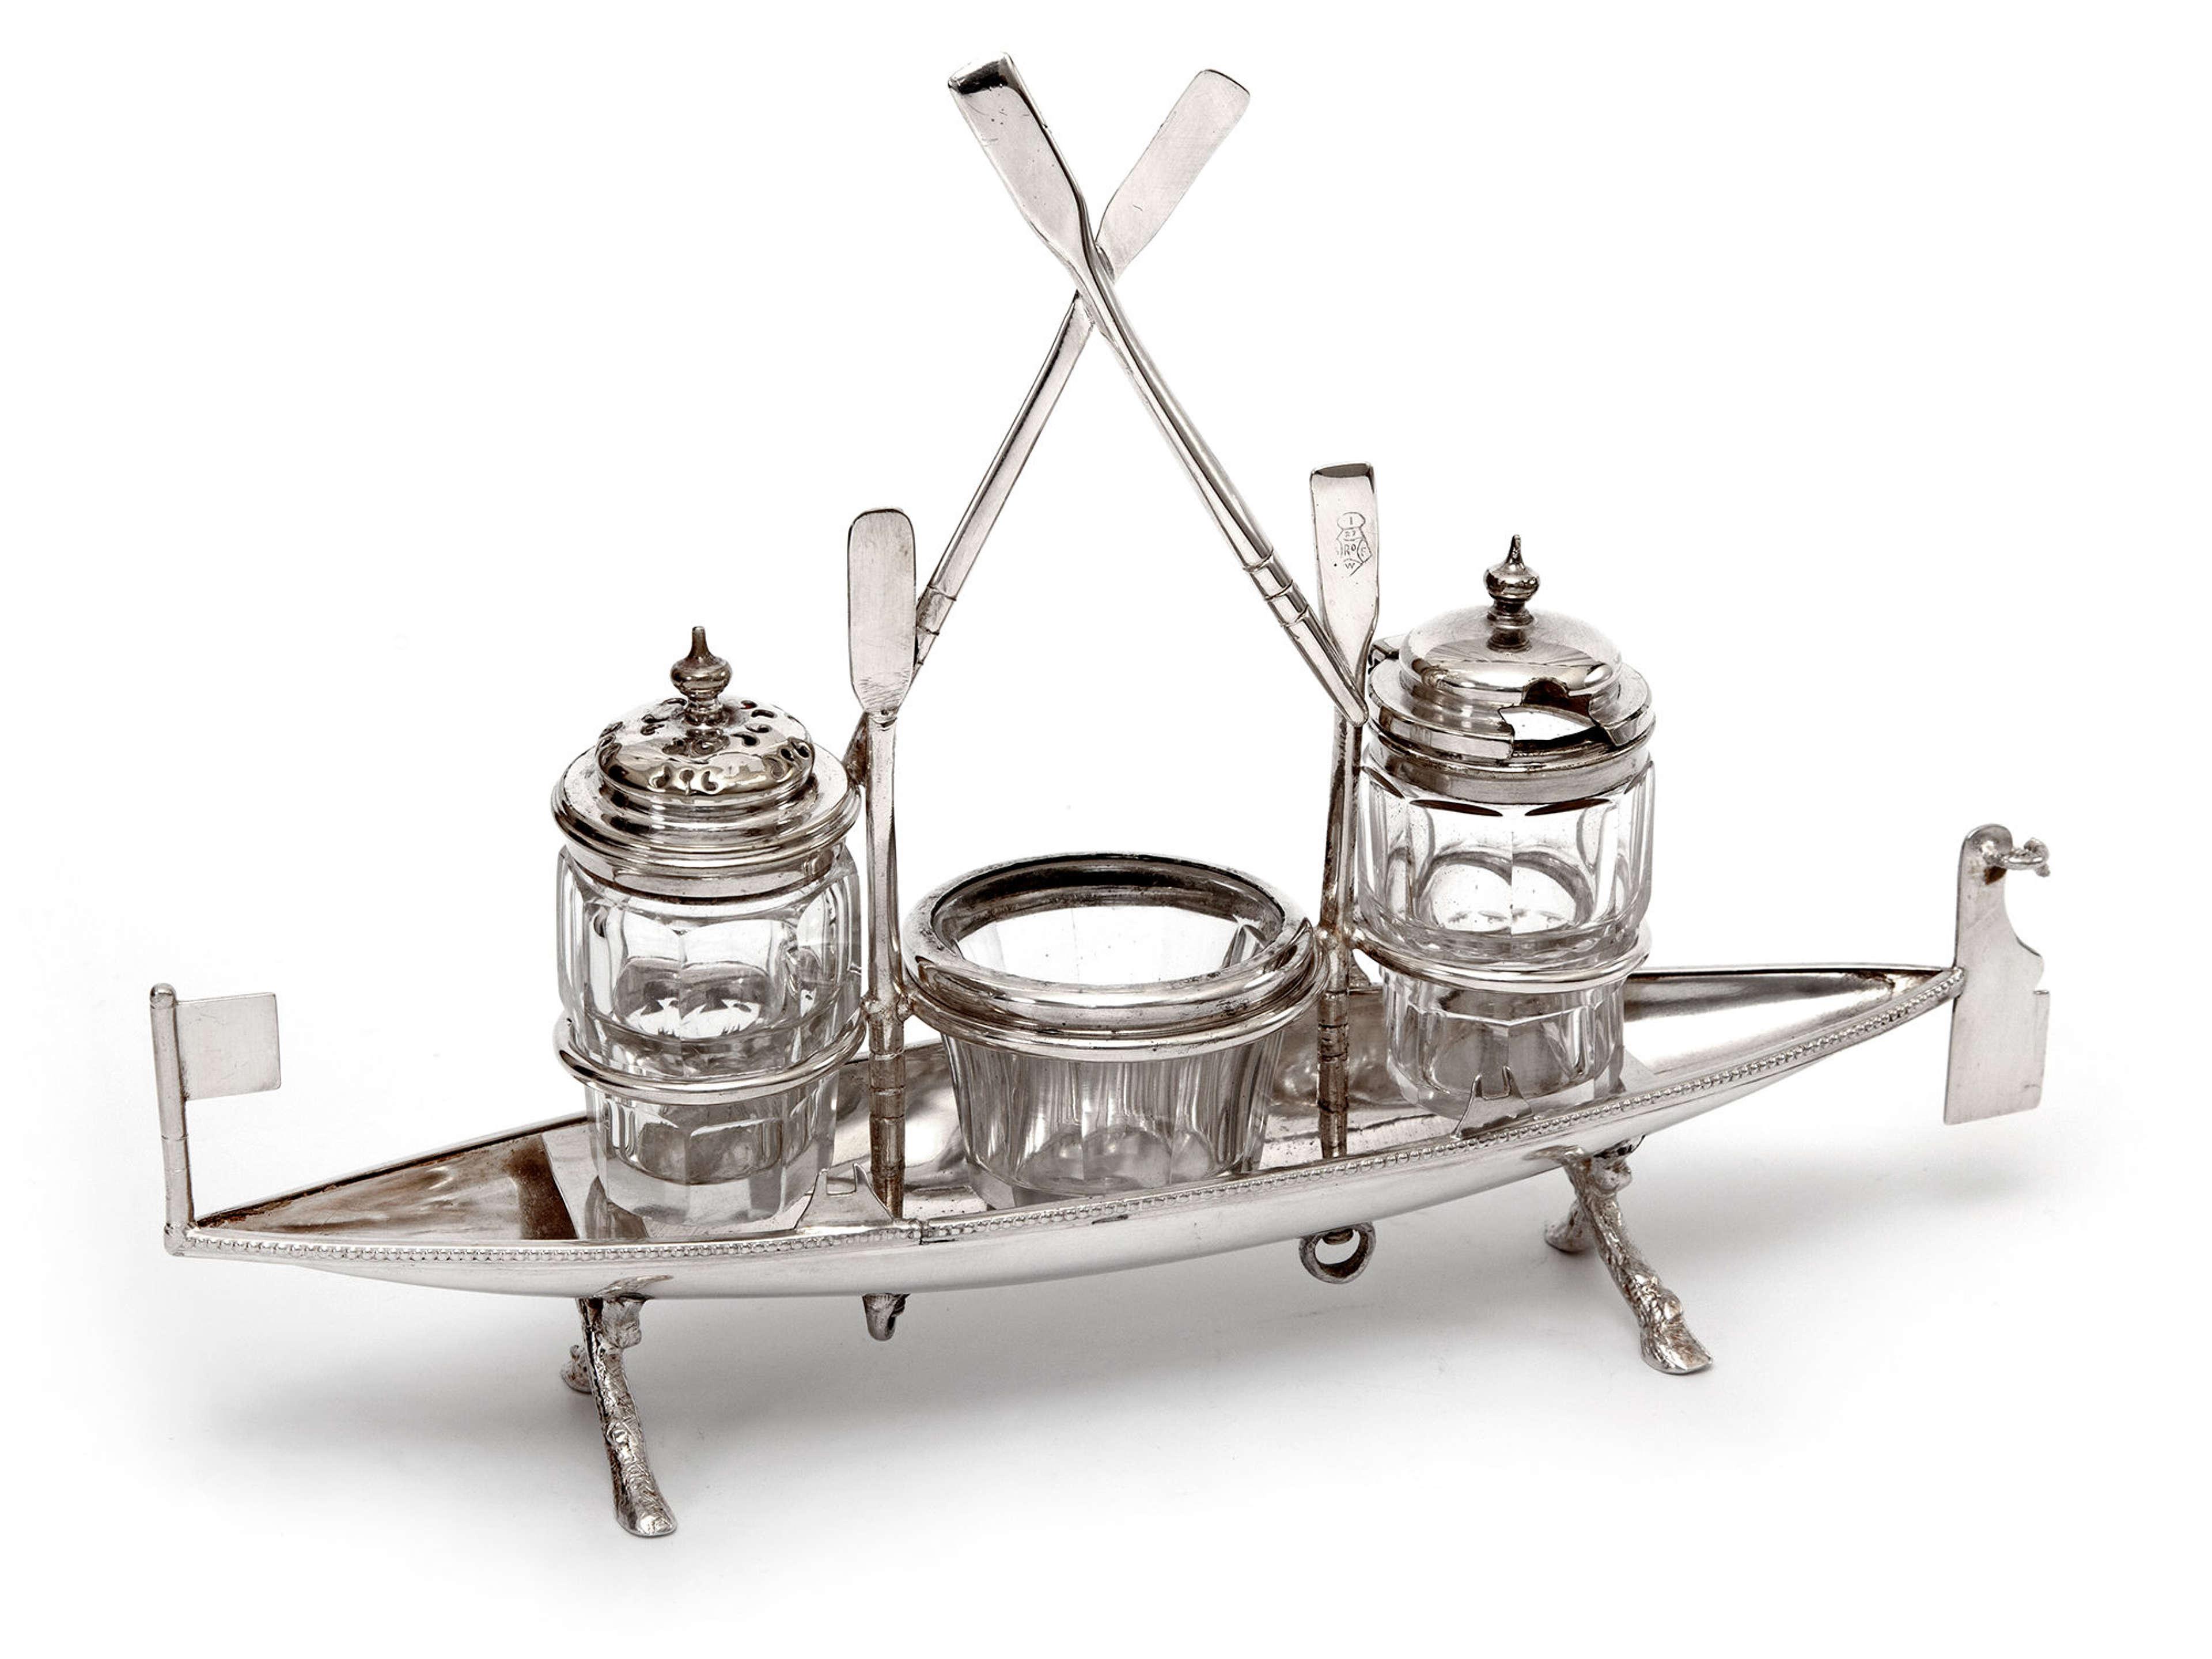 Unusual Victorian Silver Plate Novelty Rowing Boat Cruet Set